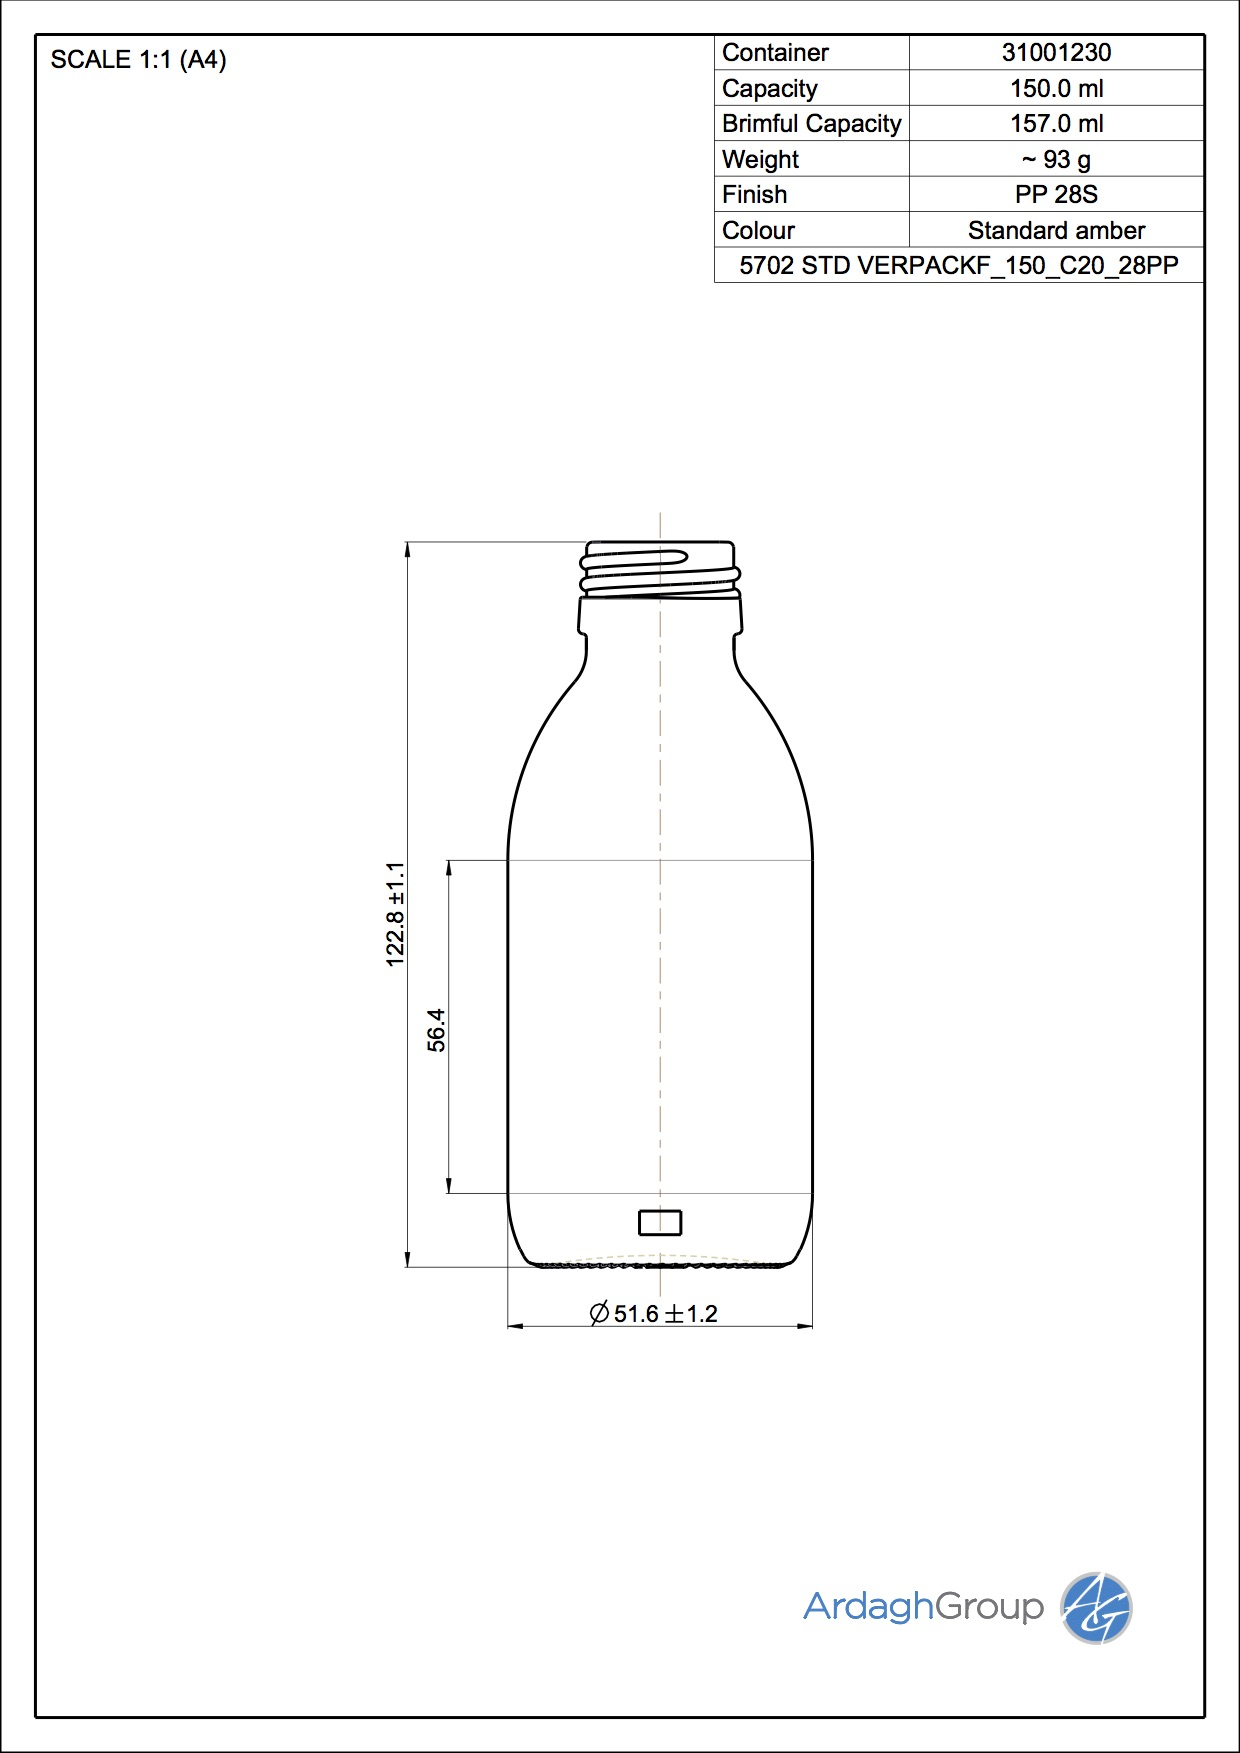 5702 Std. Verpackf 150 C20